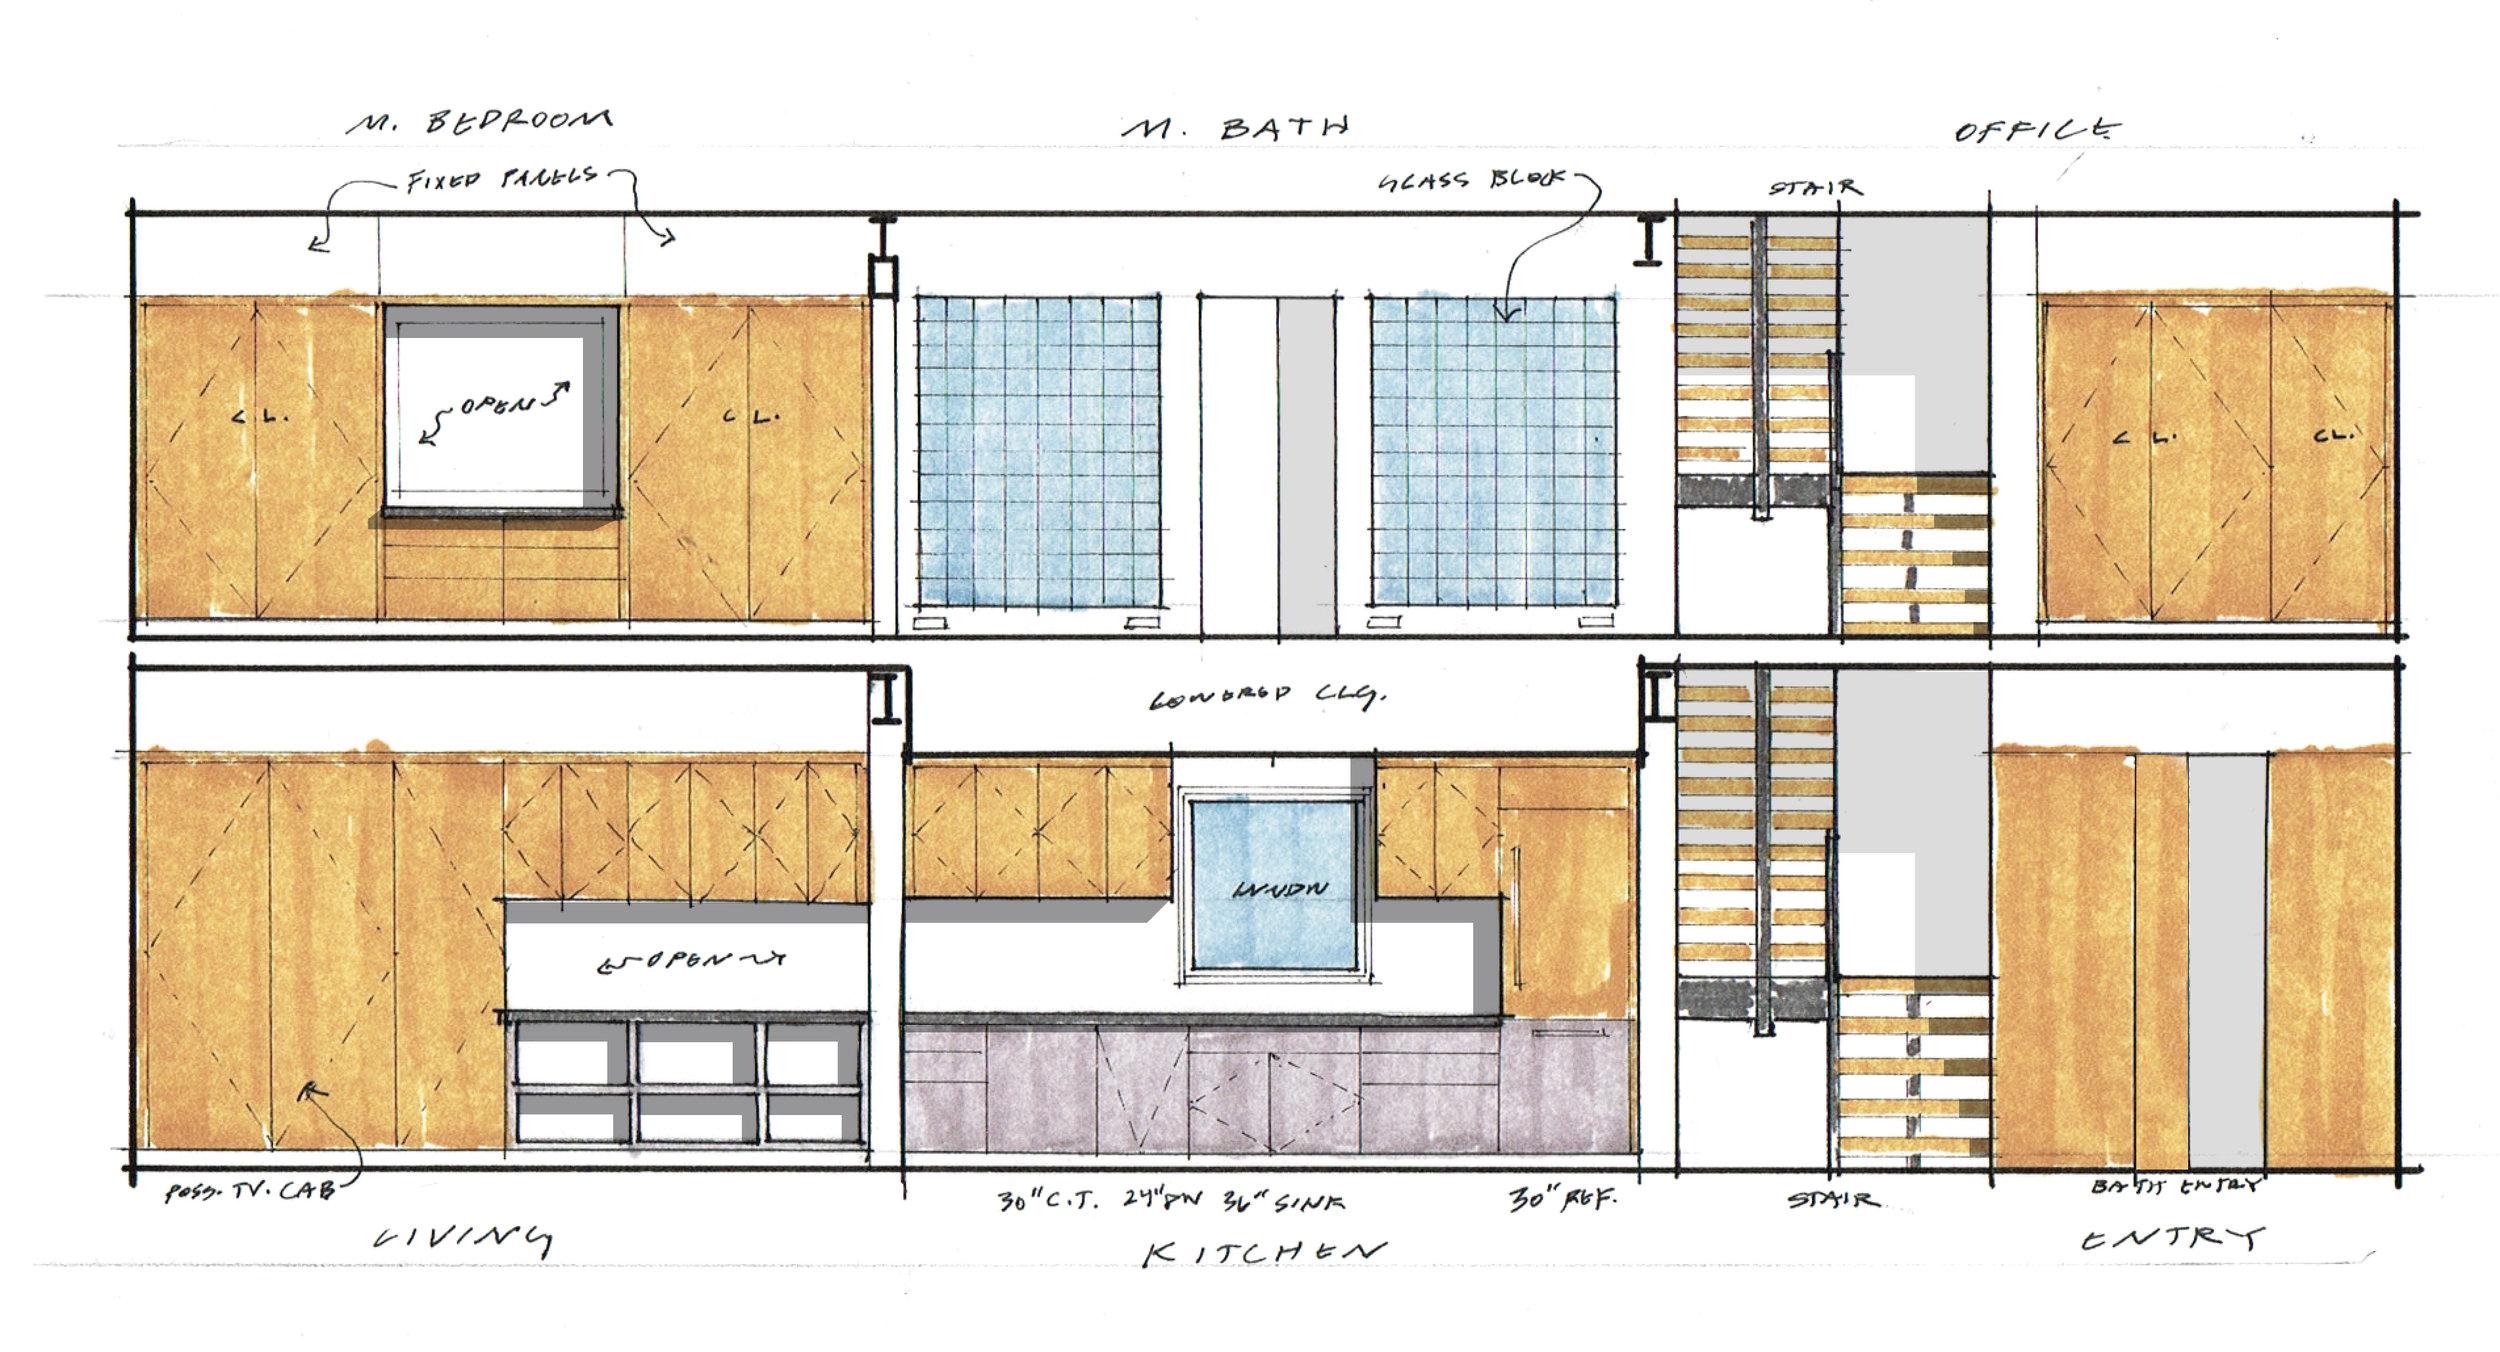 Howell - Kitchen.jpg